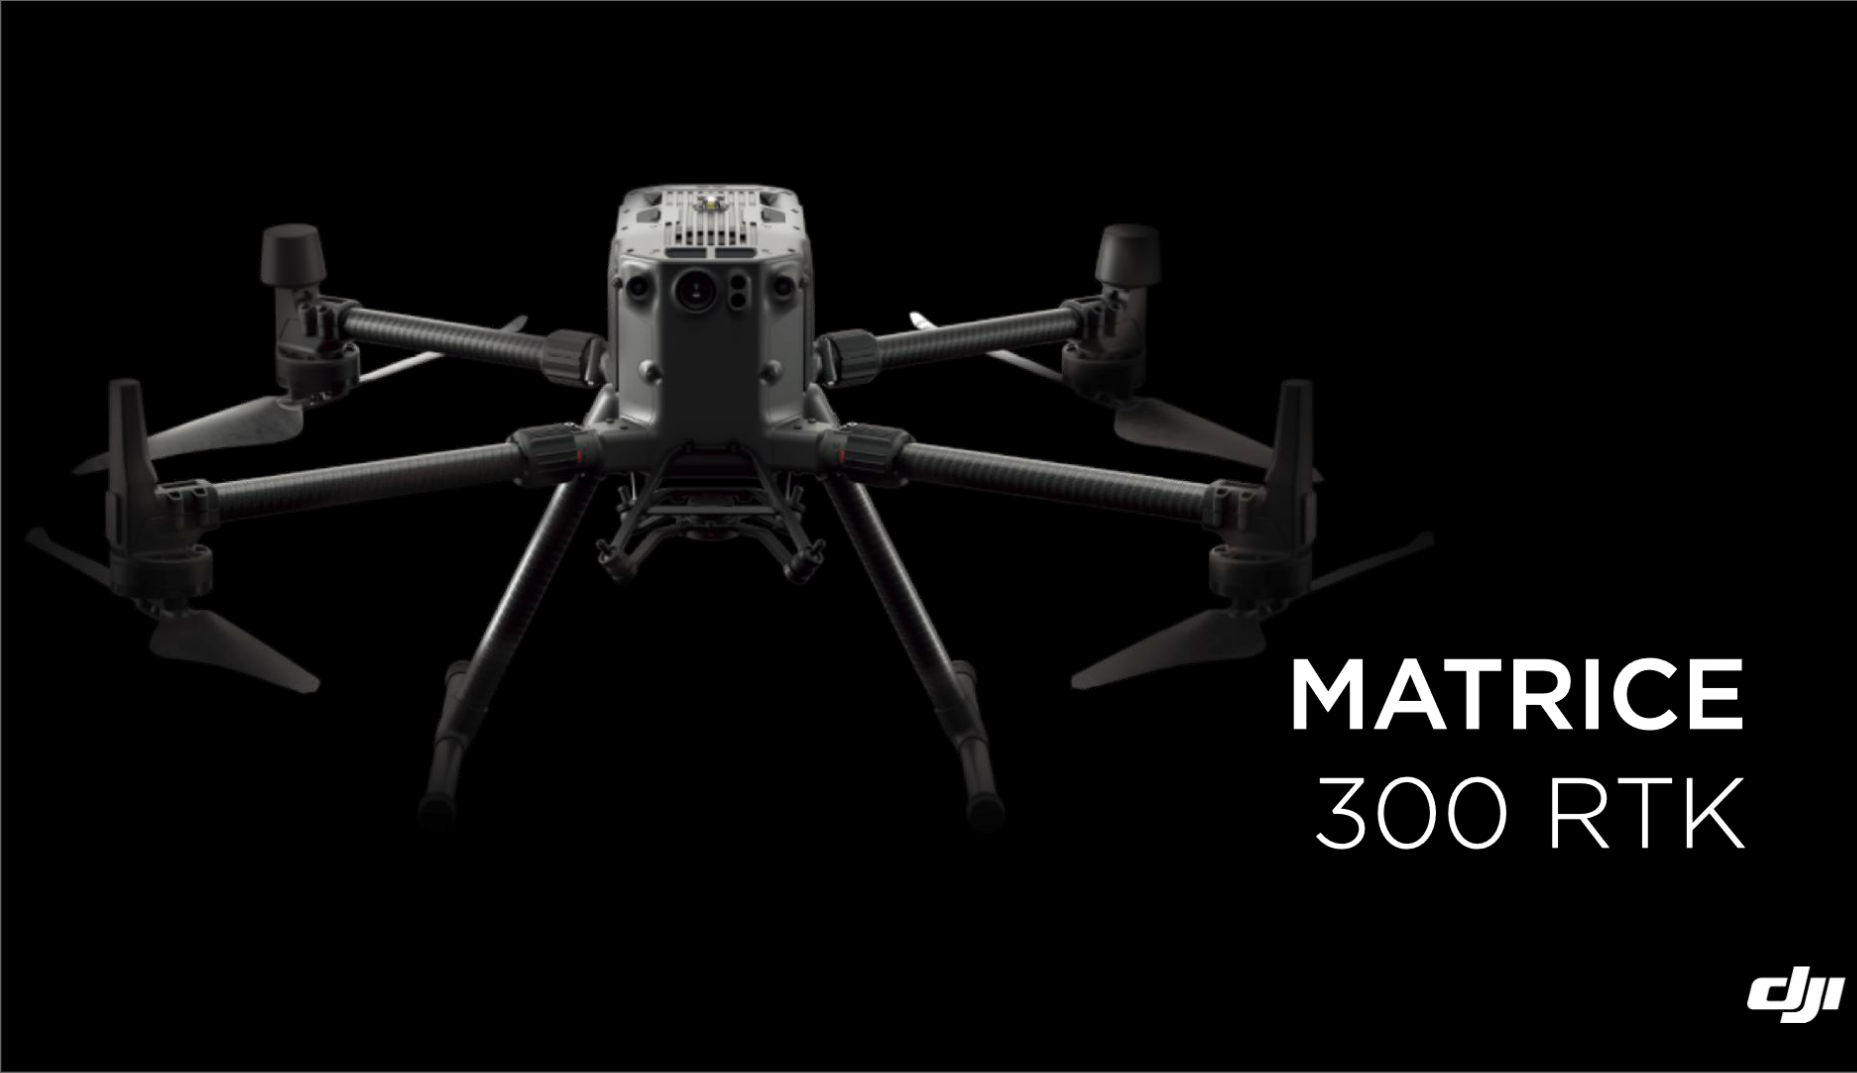 djimatrice300rtkdrone.png